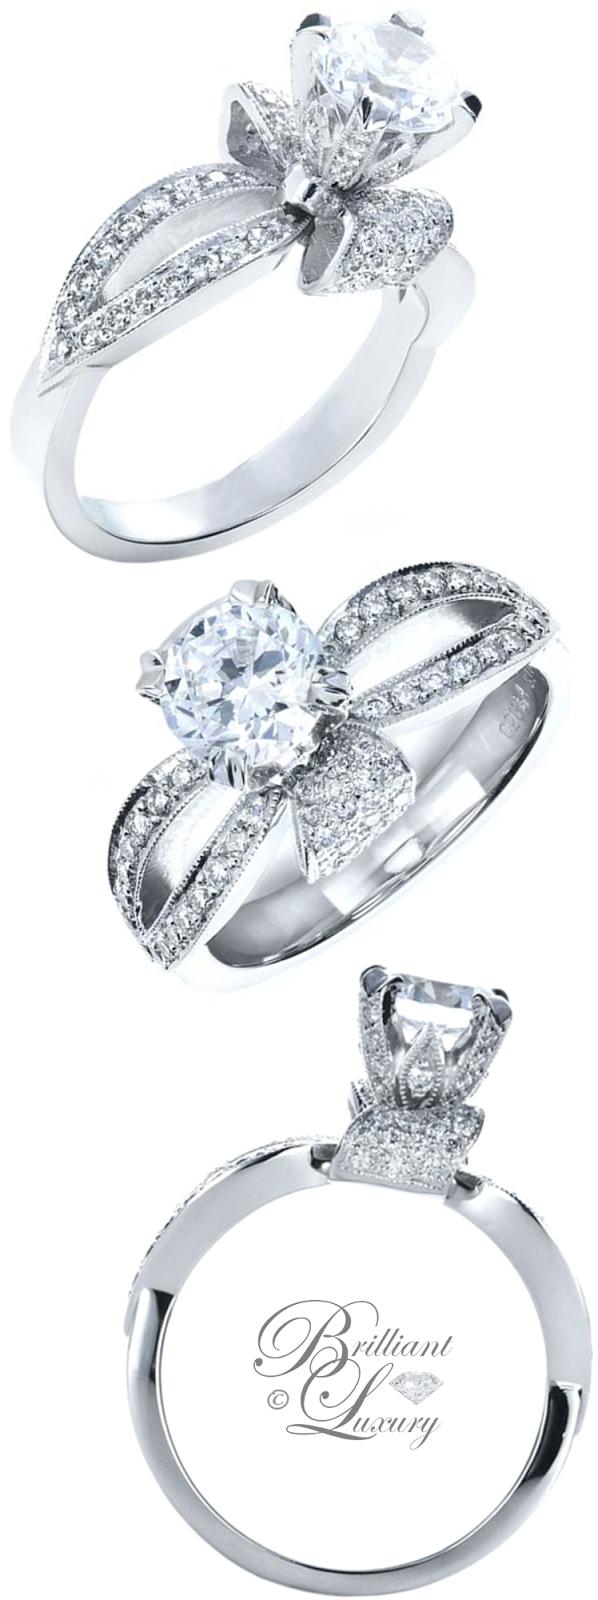 Brilliant Luxury ♦ Joseph Jewelry Diamond Pave Engagement Ring